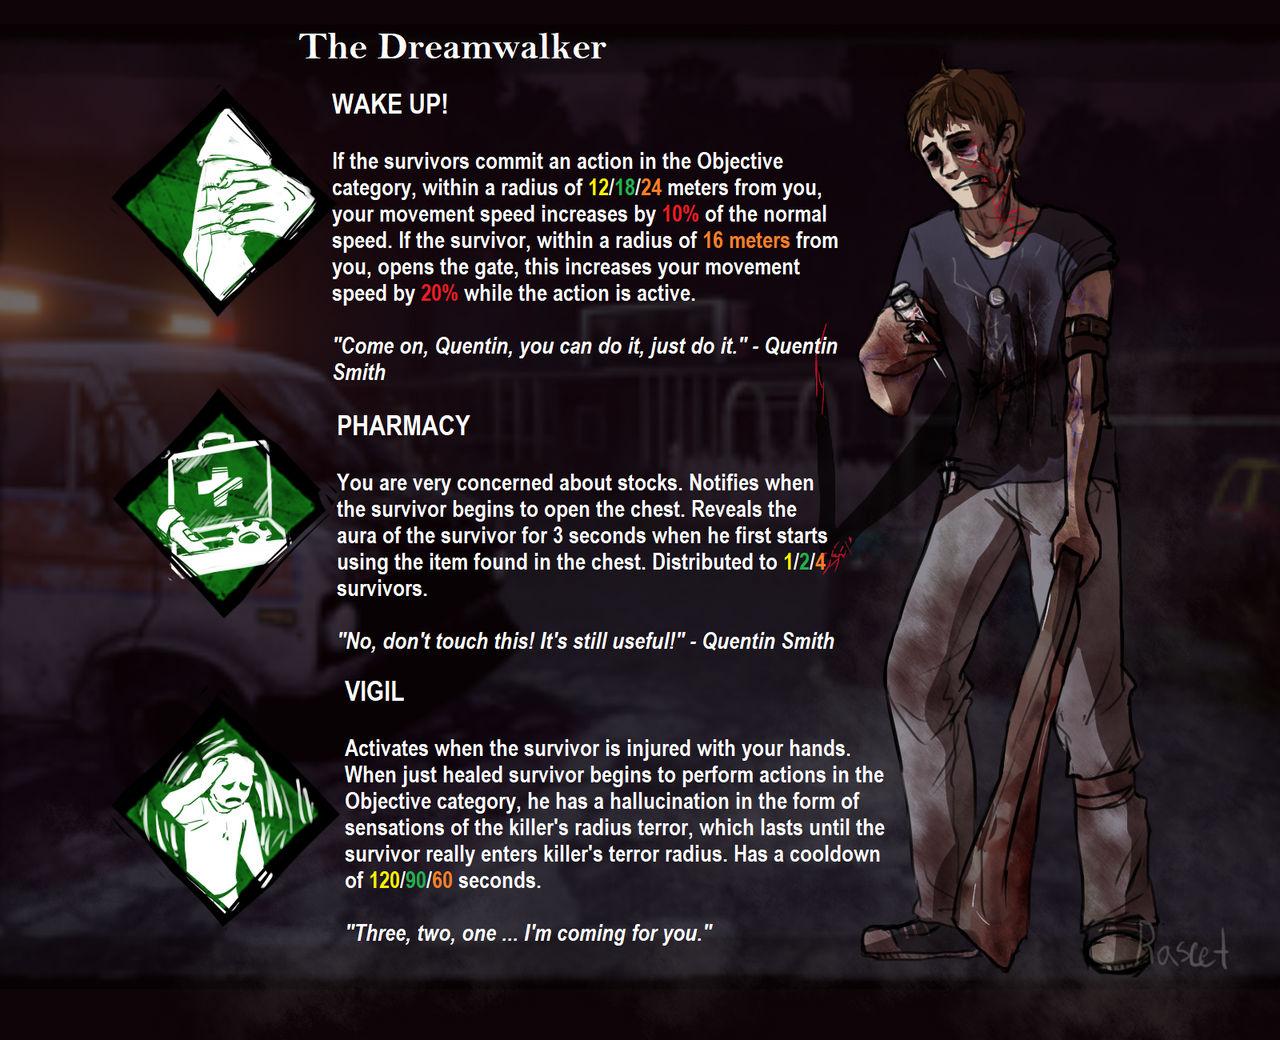 Killer!Dreamwalker by Rascet on DeviantArt